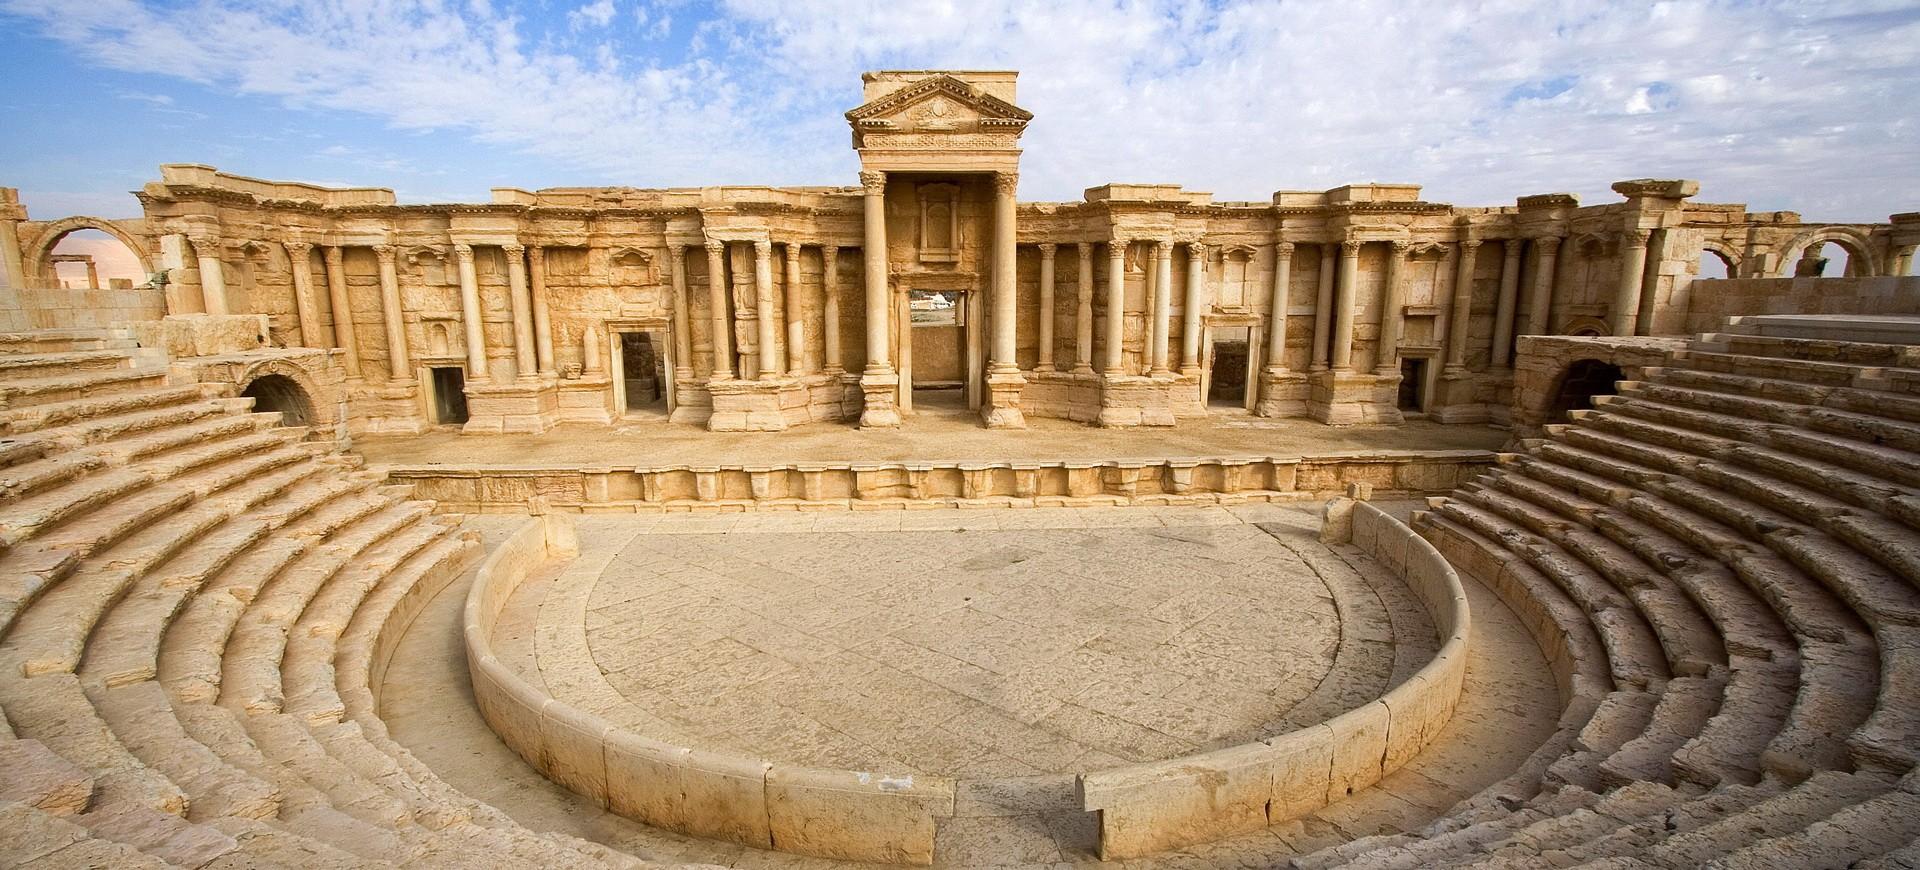 Syrie Palmyre Royaume de la Reine Zénobie